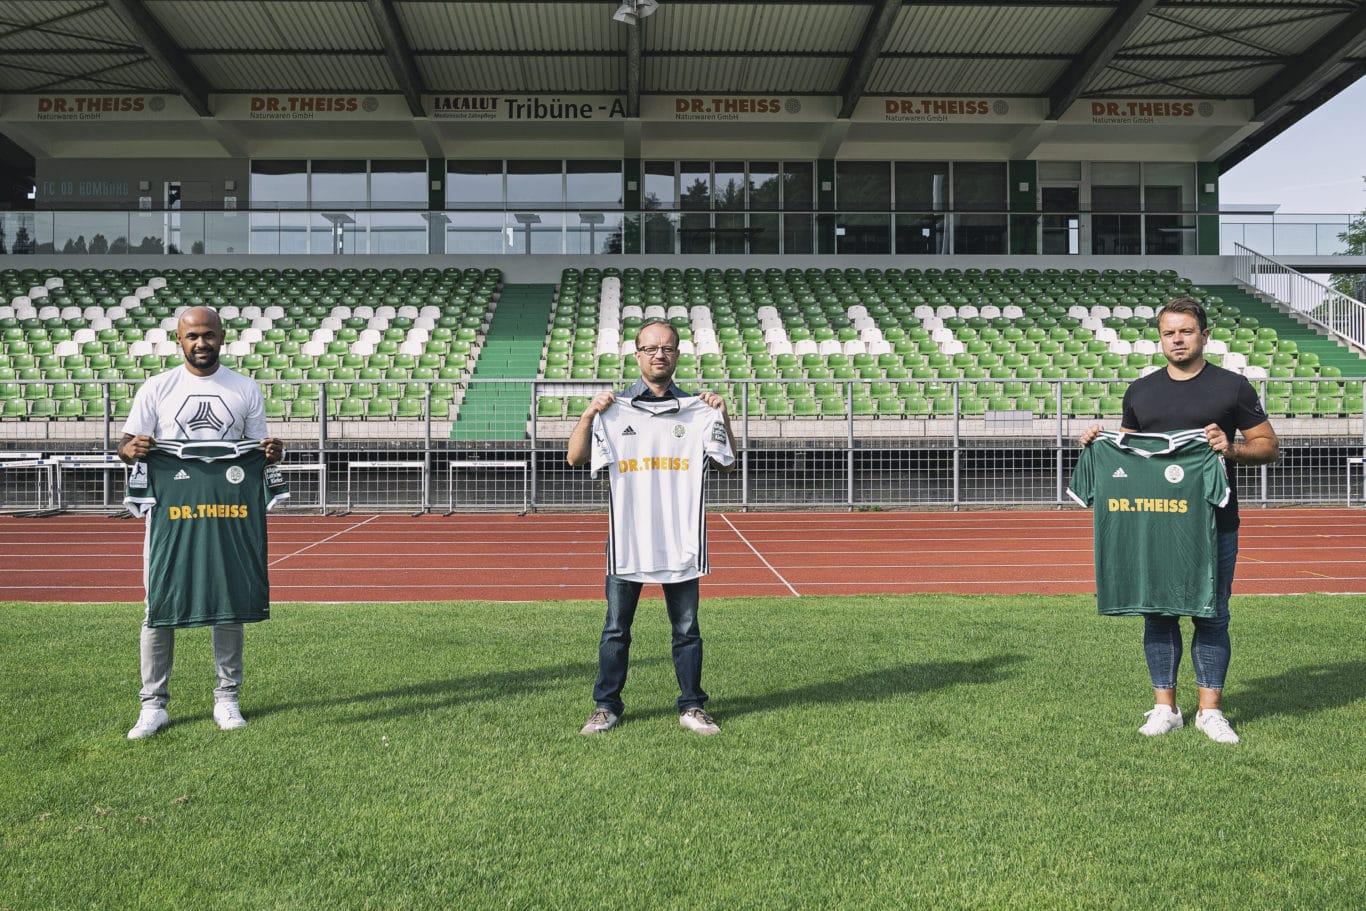 Carithasan Vijayendran (Teamsport Philipp Saar), Rafael Kowollik (FCH-Geschäftsführer), Roland Klose( adidas) | Bild: FC Homburg